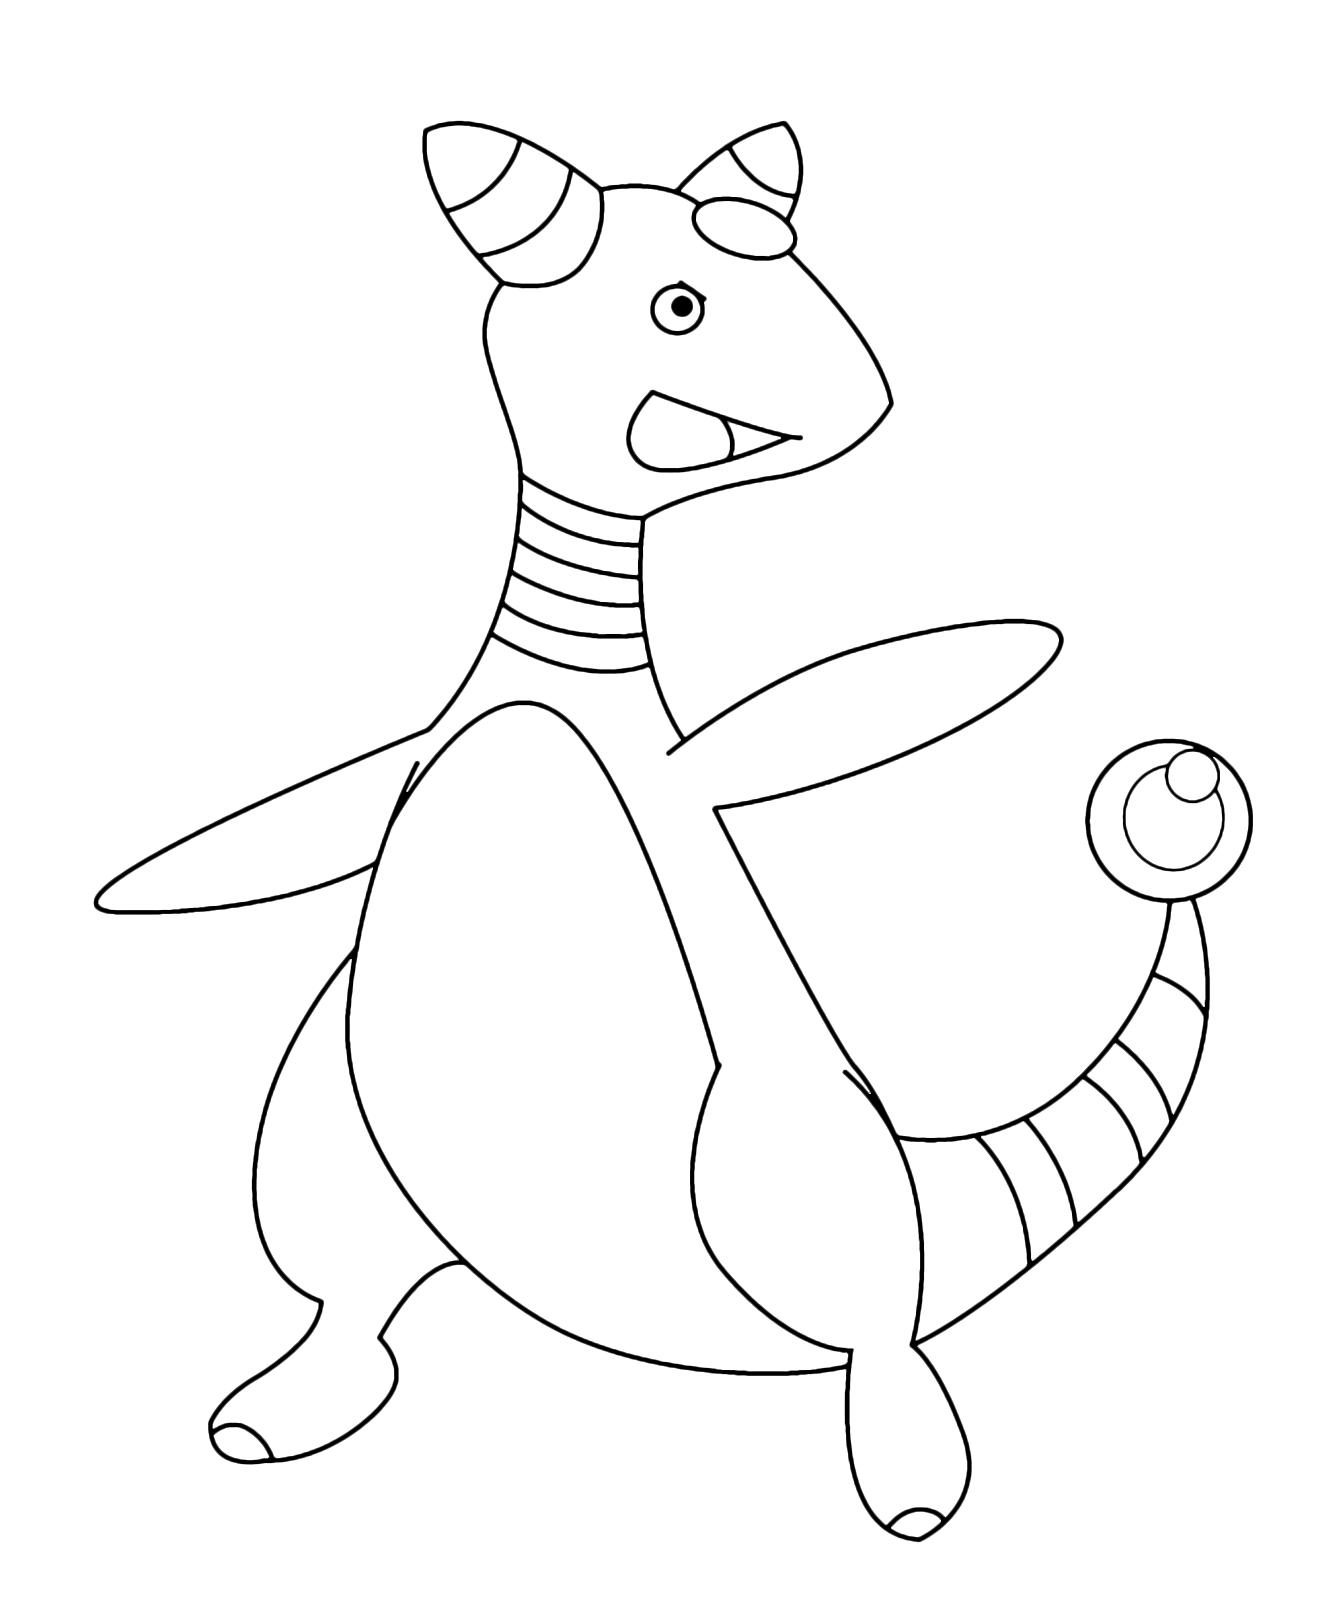 Pok mon Gen 2 Ampharos Pokemon